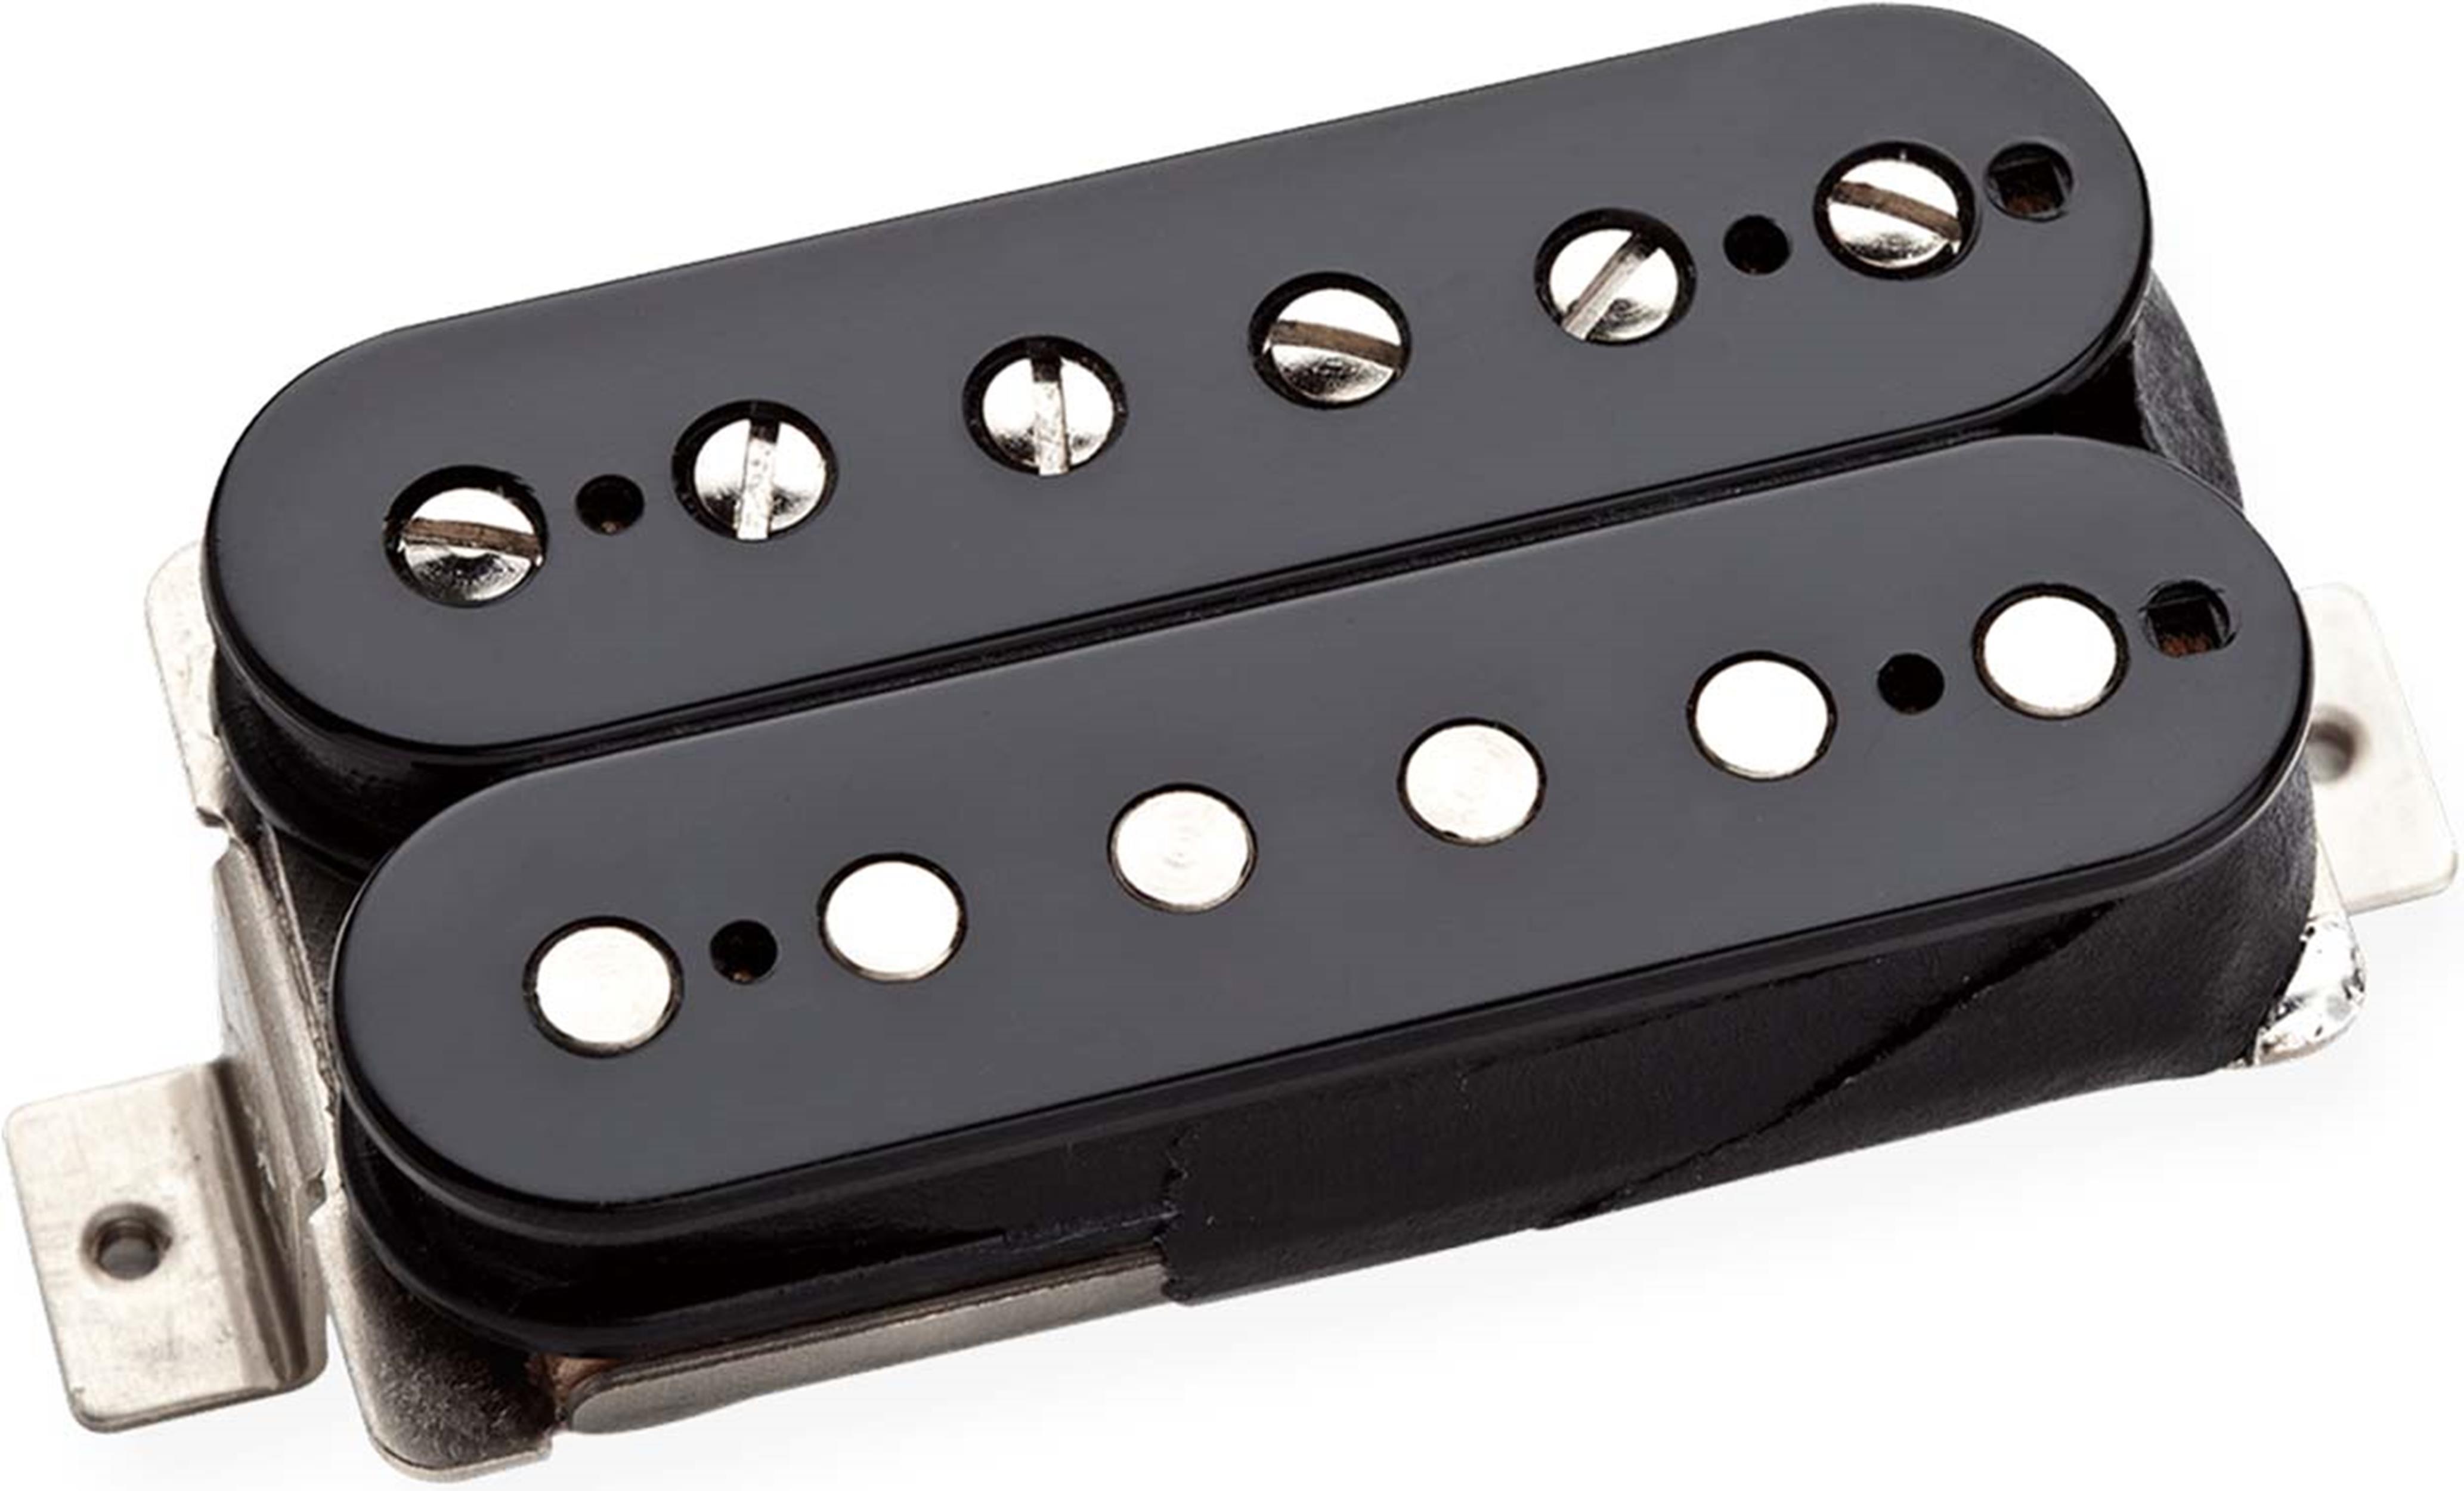 SEYMOUR-DUNCAN SH 1 N 4C 59 MODEL 4 CONDUCTORS BLACK NECK